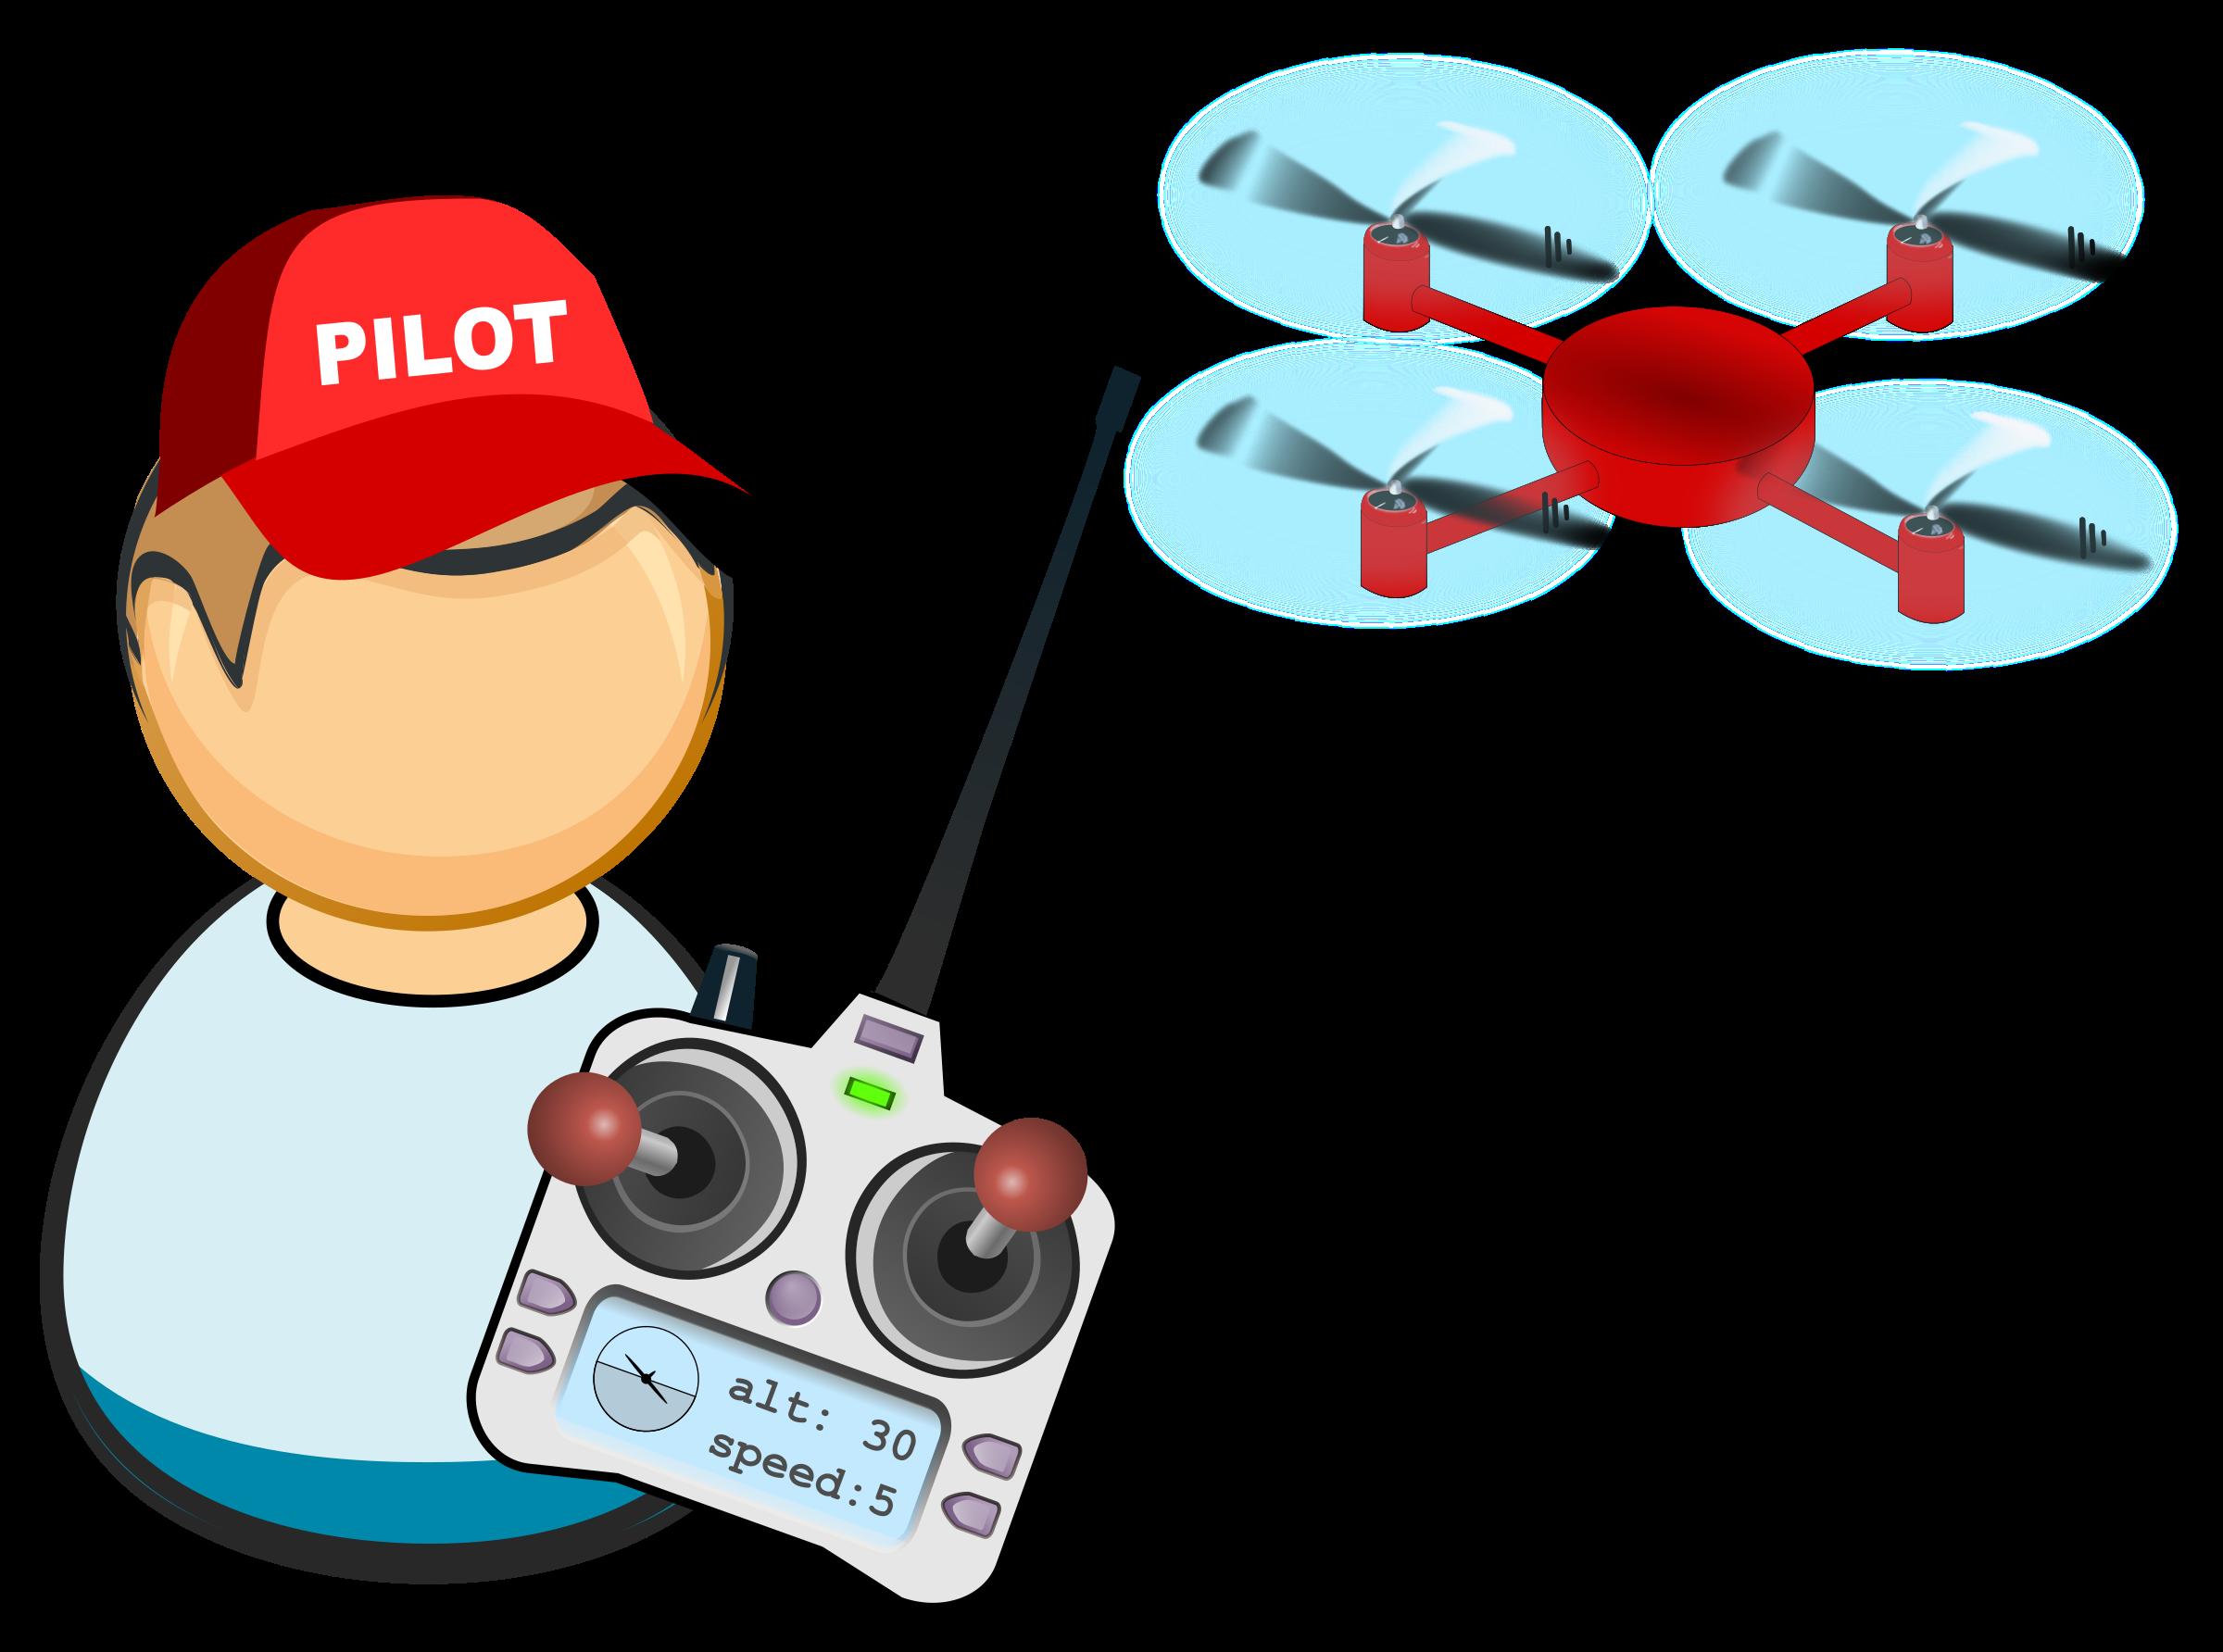 Drone uav big image. Pilot clipart pilot plane